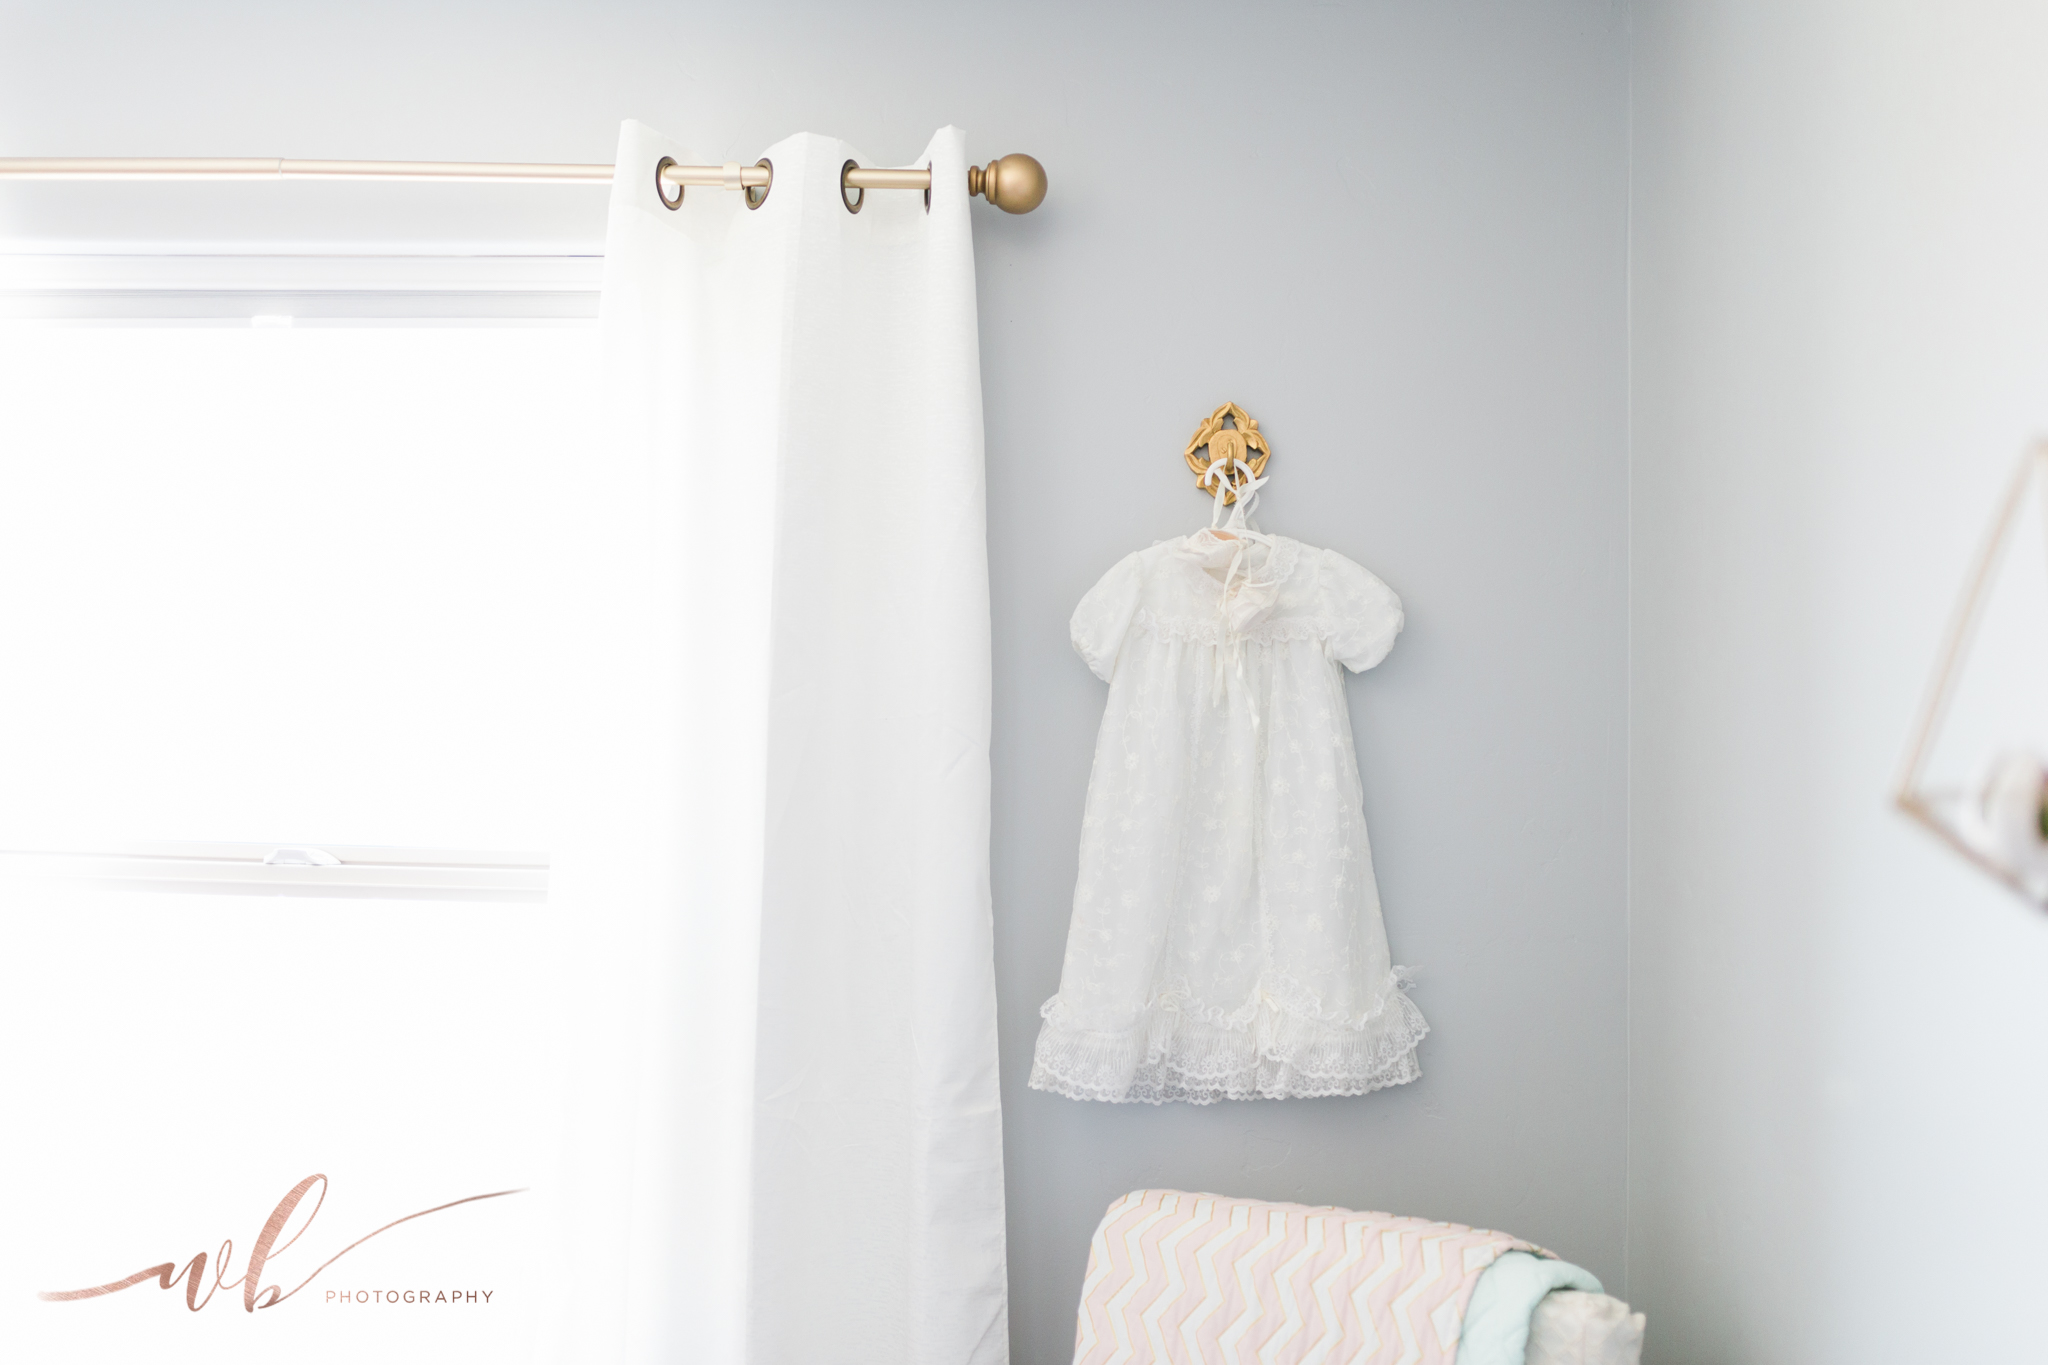 lifestyle-newborn-photography-whitney-bufton-photography-utah-1.jpg